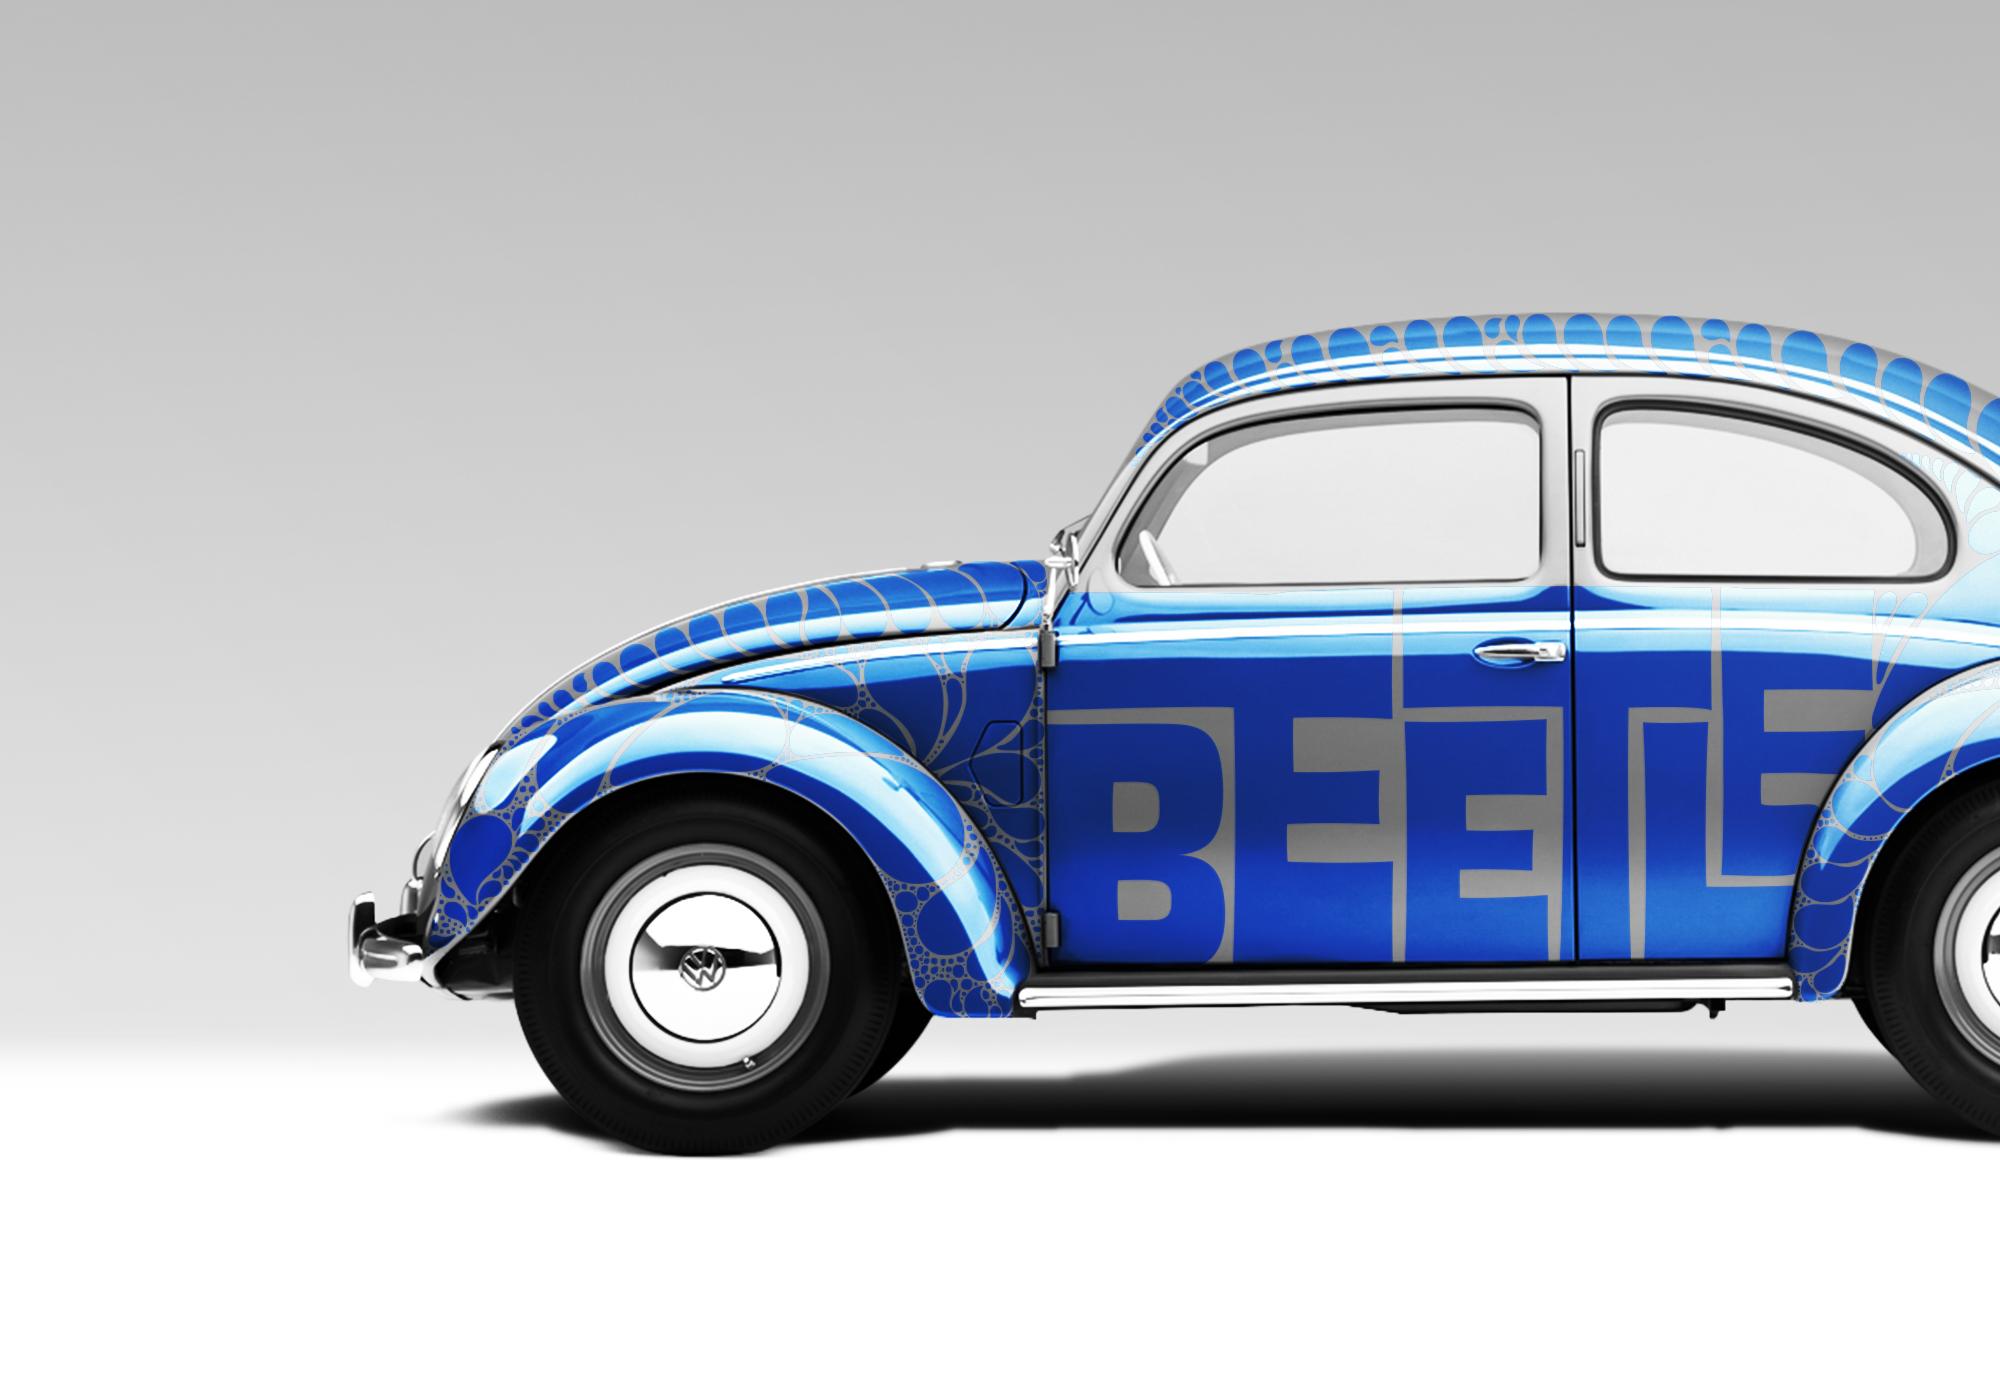 ADS_Illustration_VW_Beetle_2.jpg